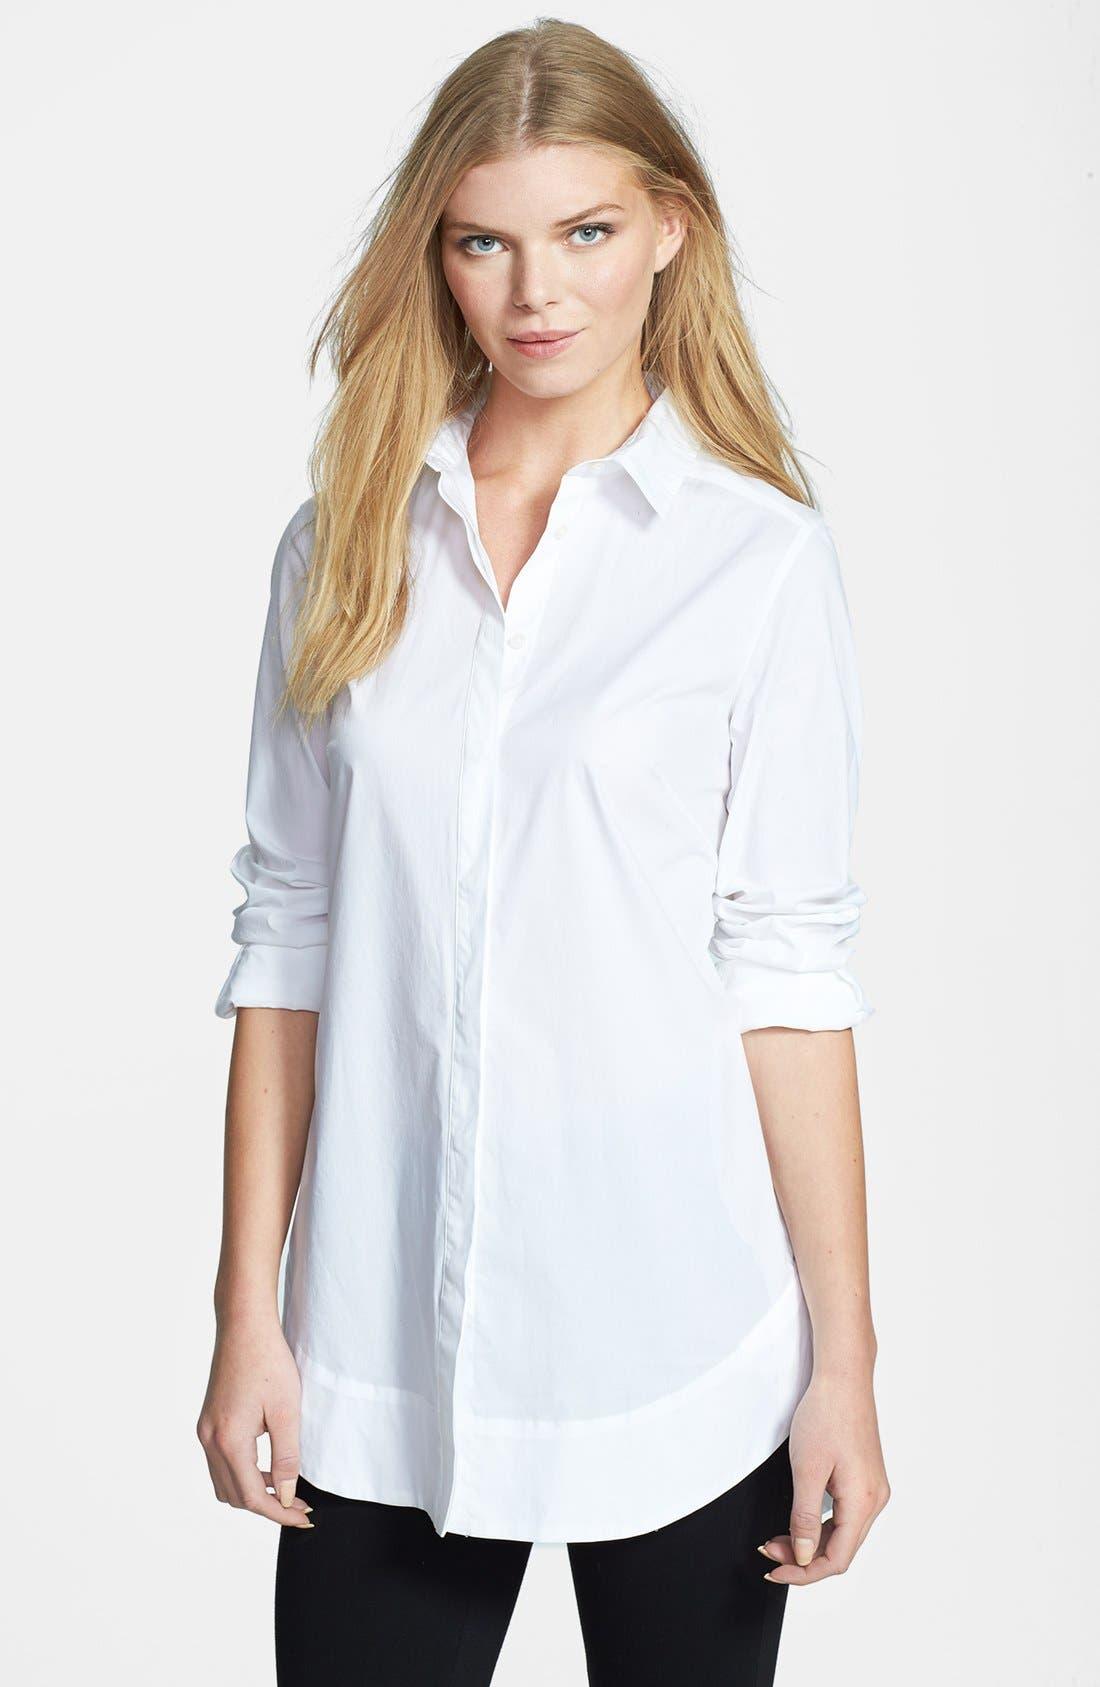 Main Image - Weekend Max Mara 'Refolo' Poplin Tunic Shirt